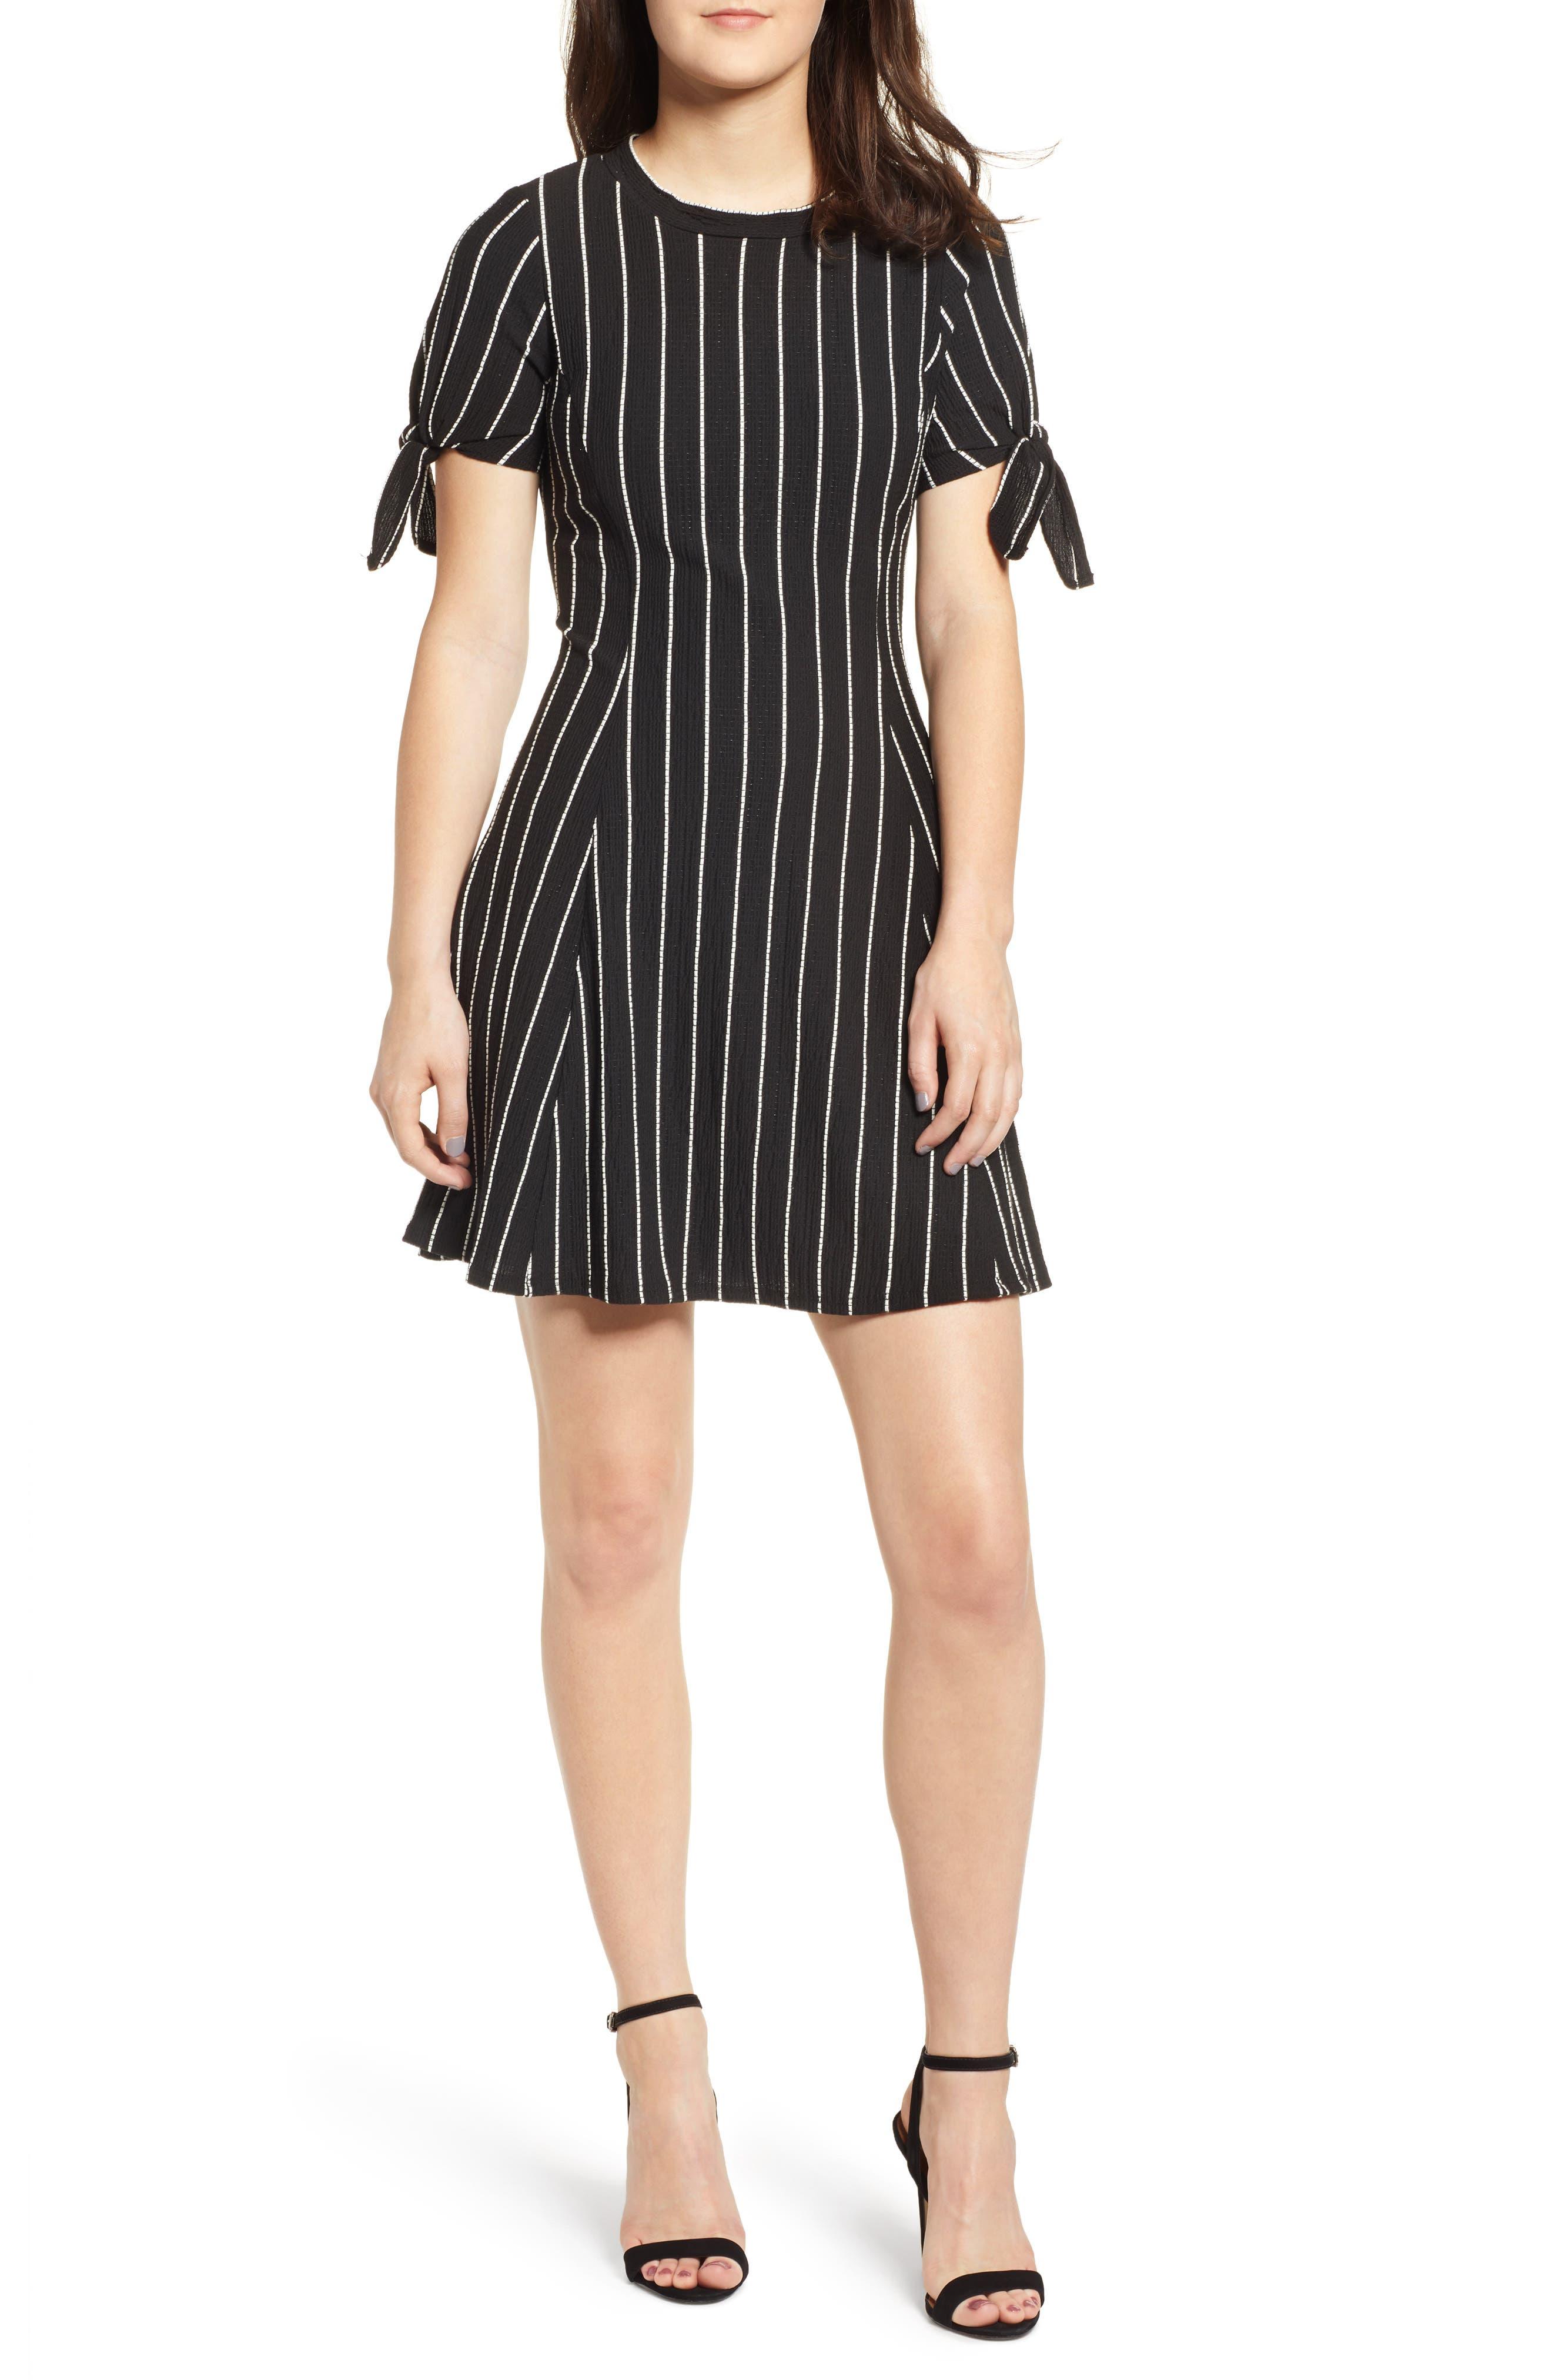 Speechless Stripe A-Line Dress, Black